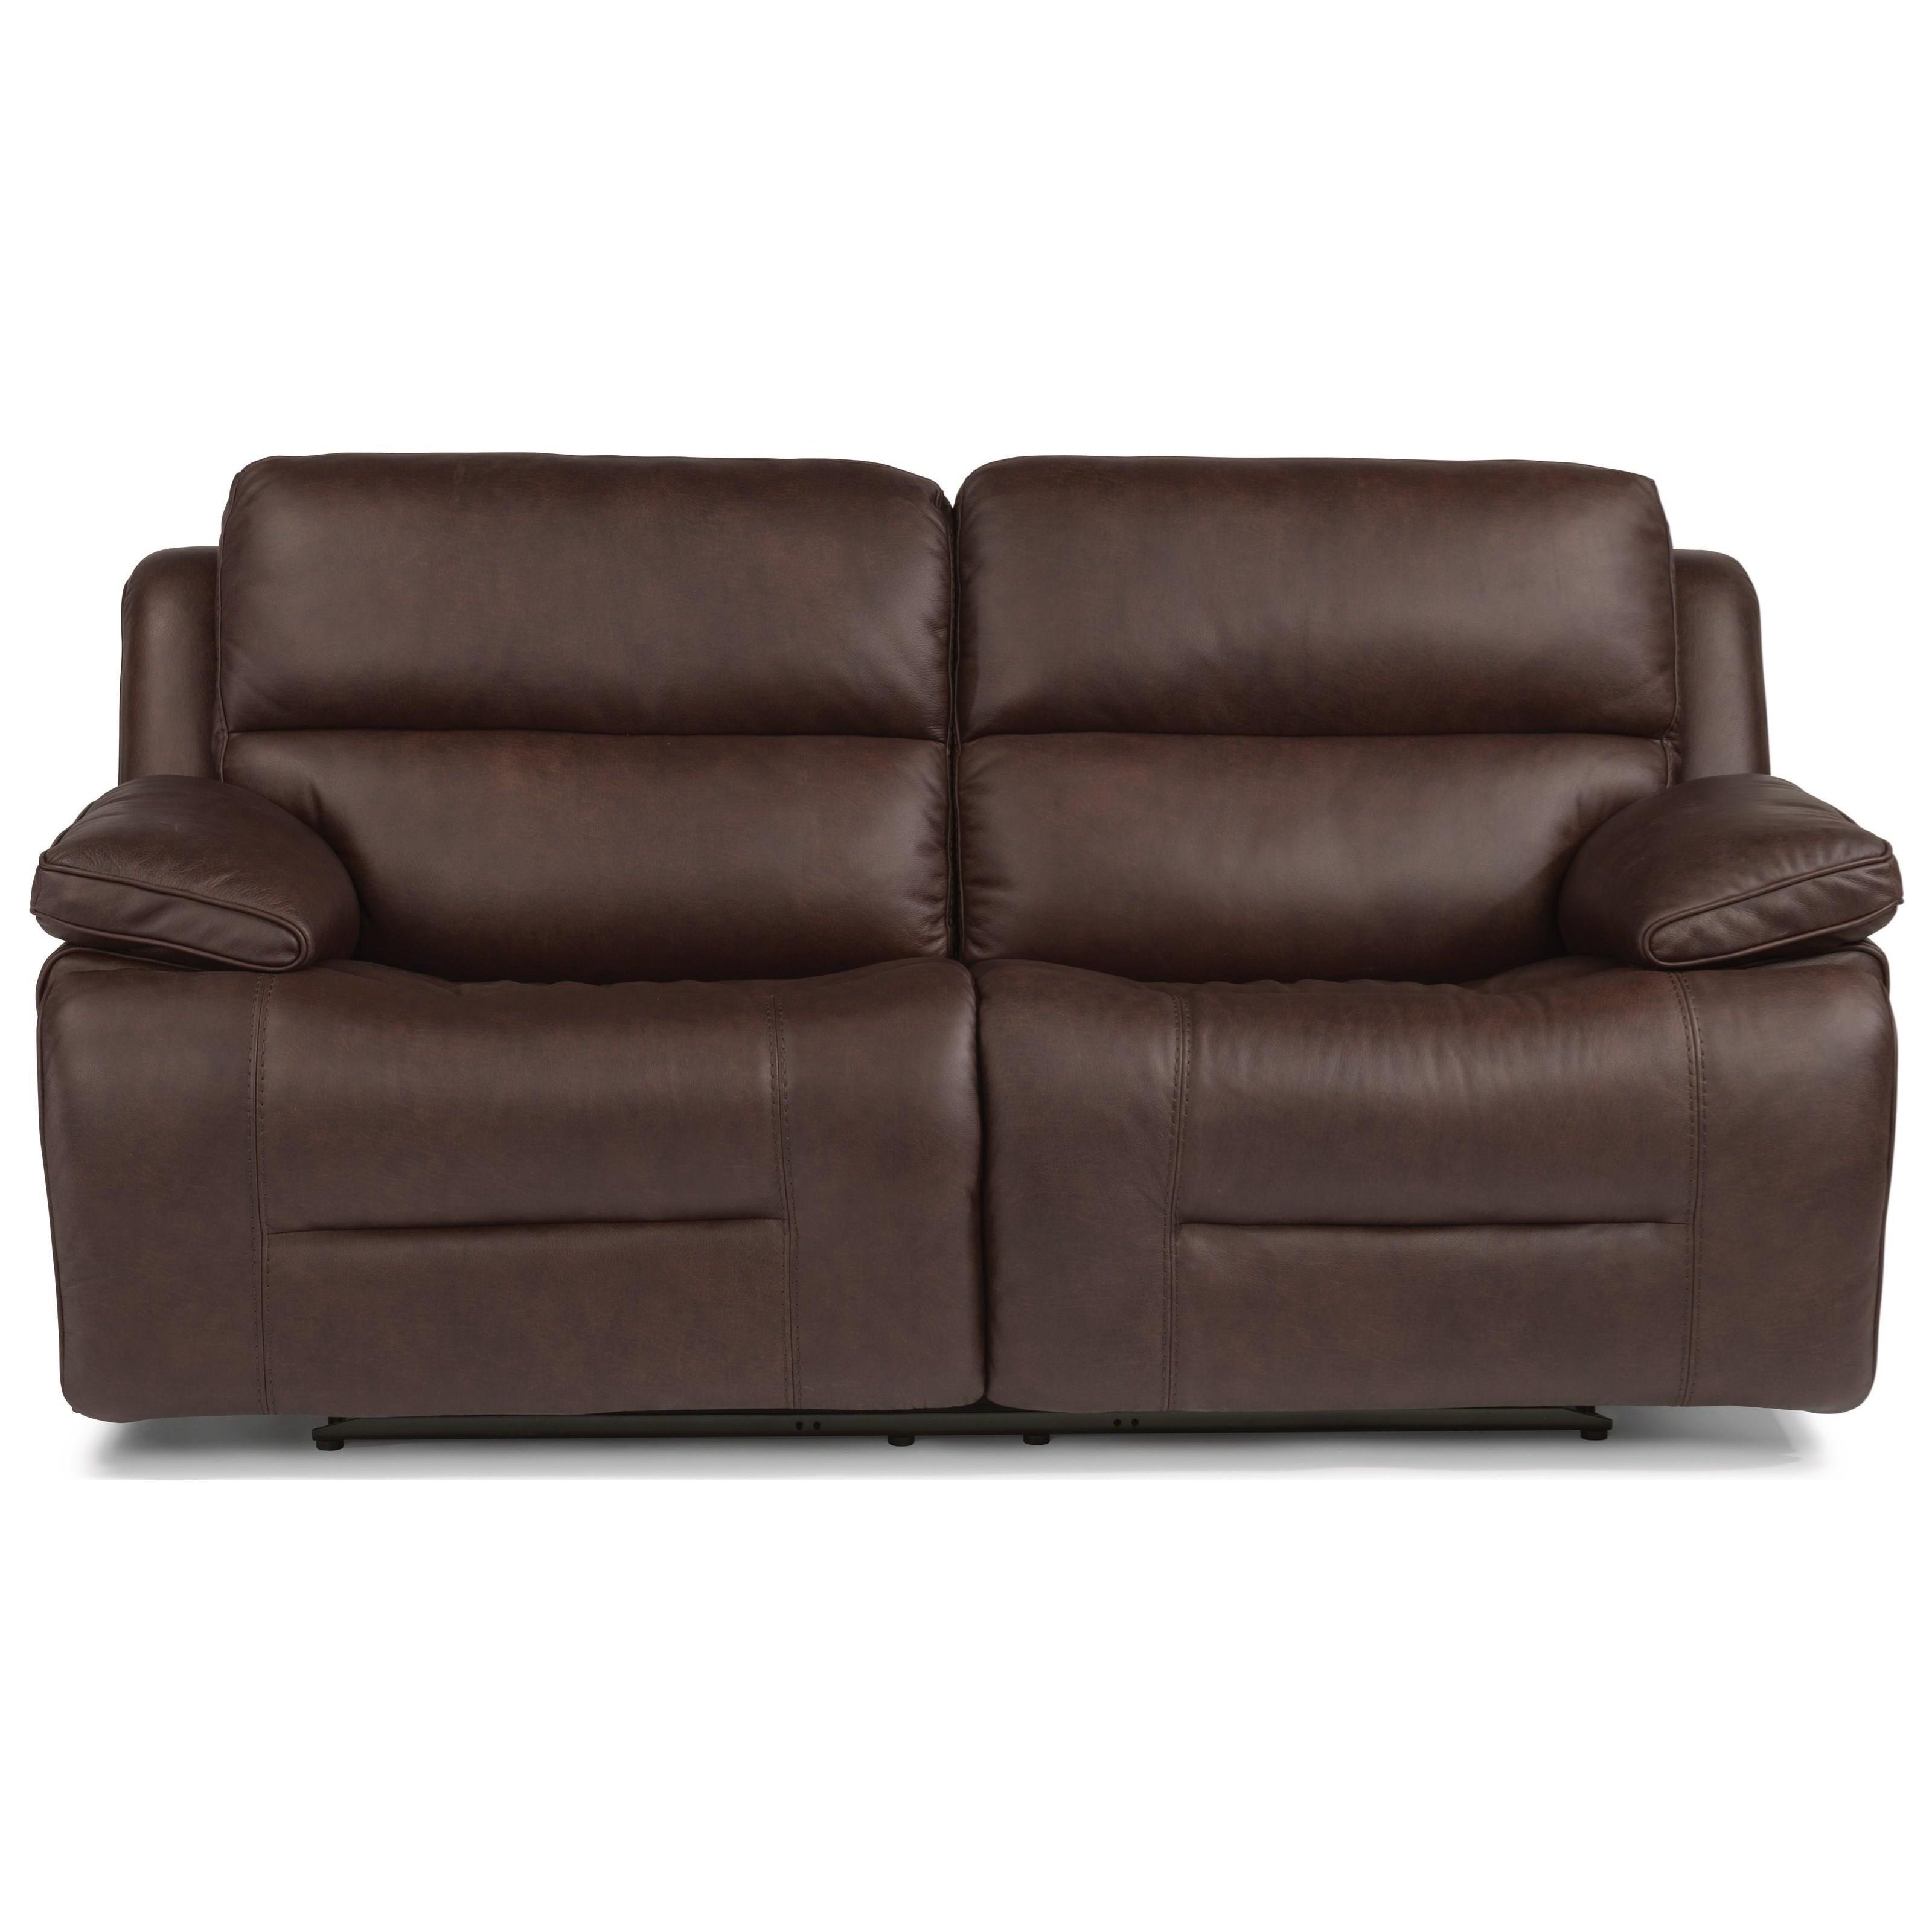 Flexsteel Wrangler Sofa: Flexsteel Creed Casual Power Reclining Sofa With Power